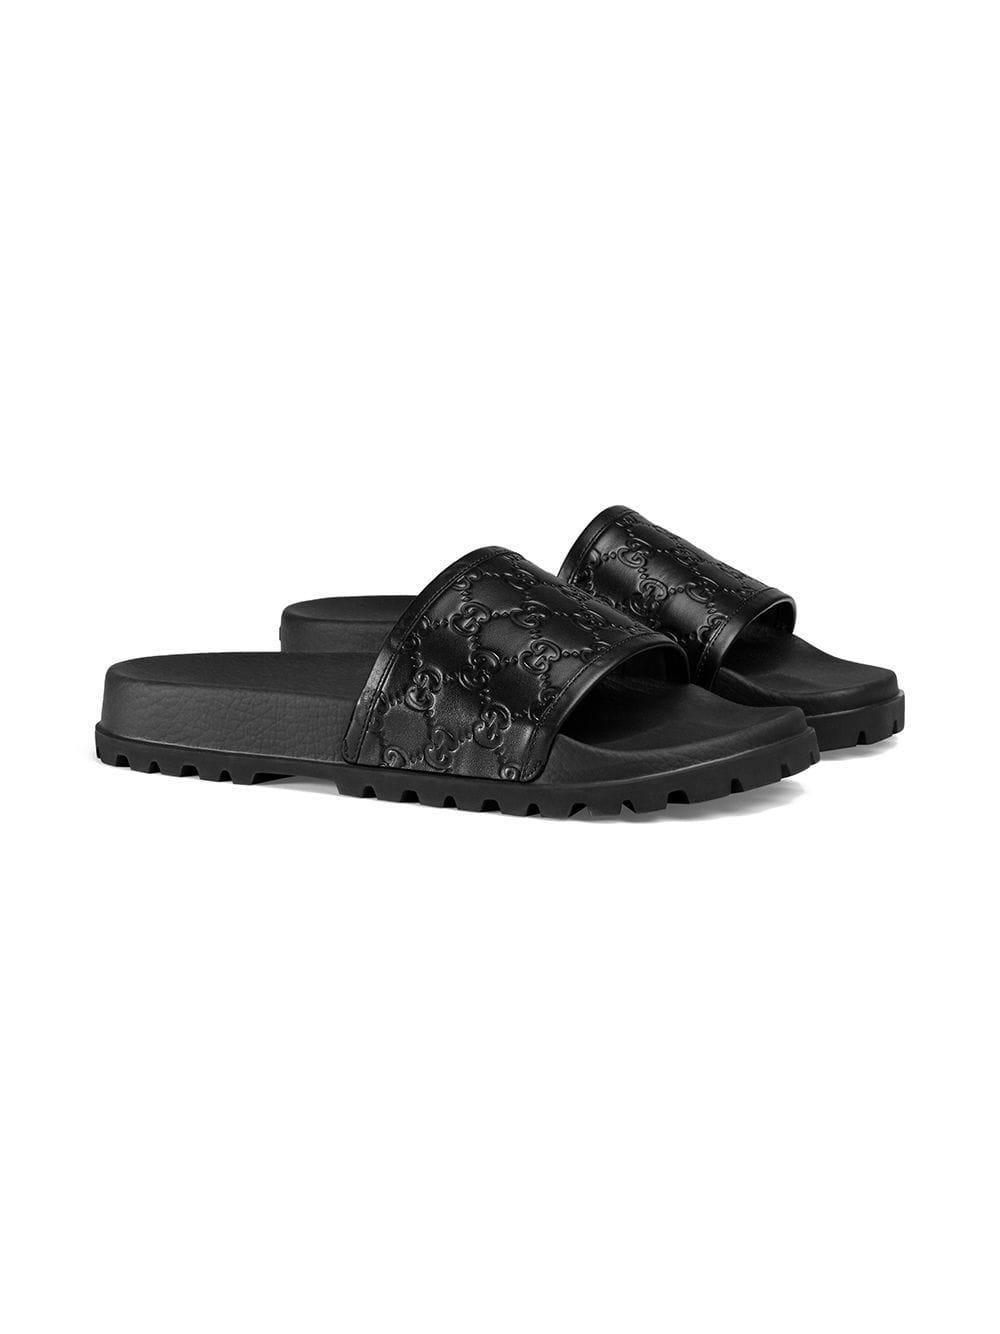 87a79719b14c Lyst - Gucci Signature Slide Sandal in Black for Men - Save 5%